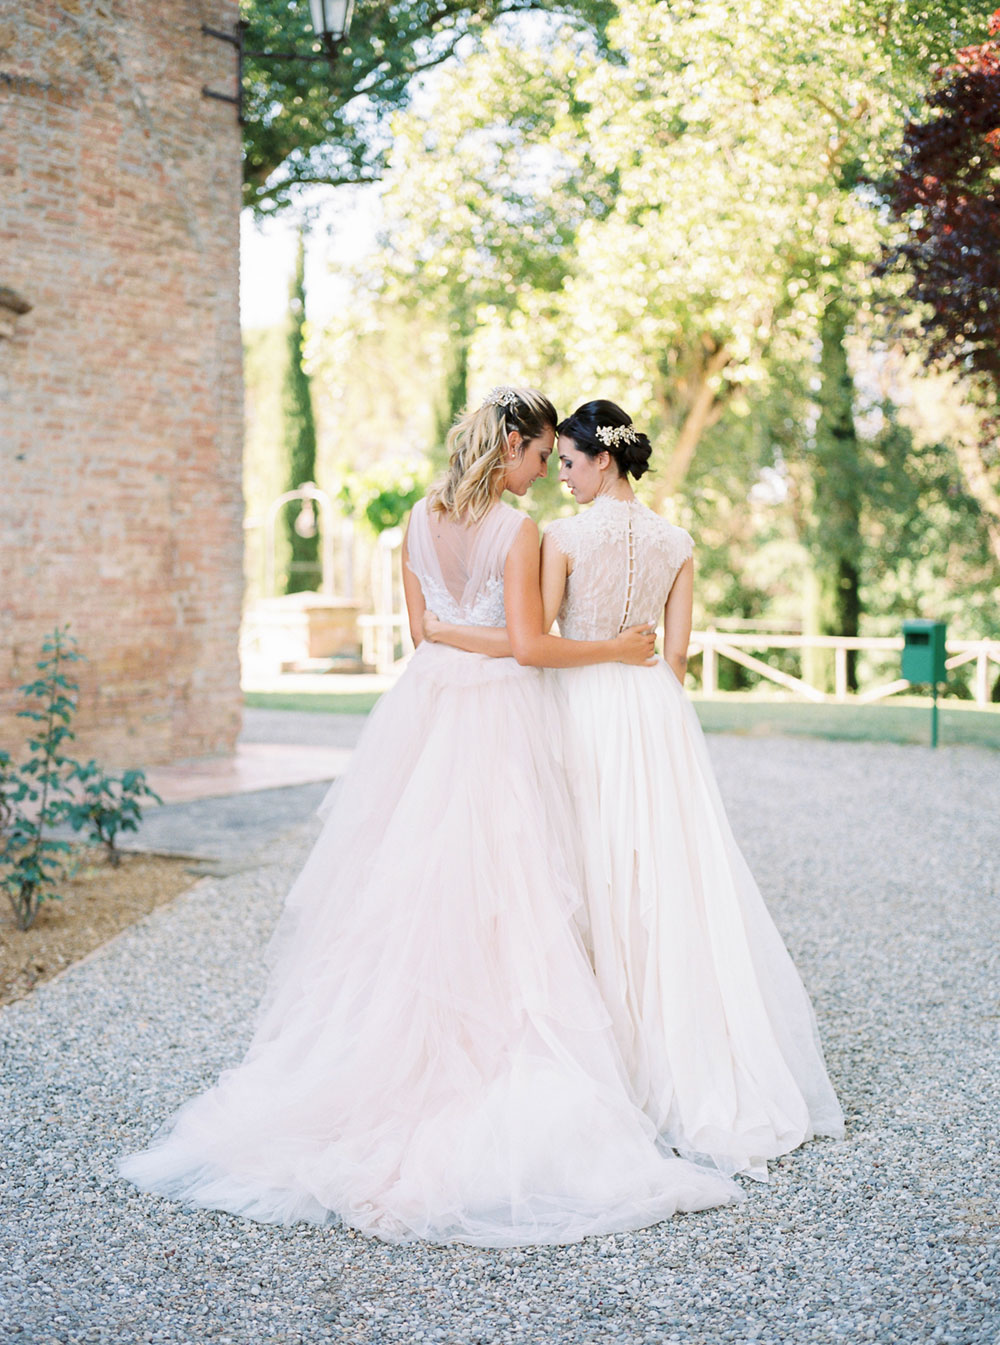 Linari-Tuscany-Elopement-Courtney-Michaela-240